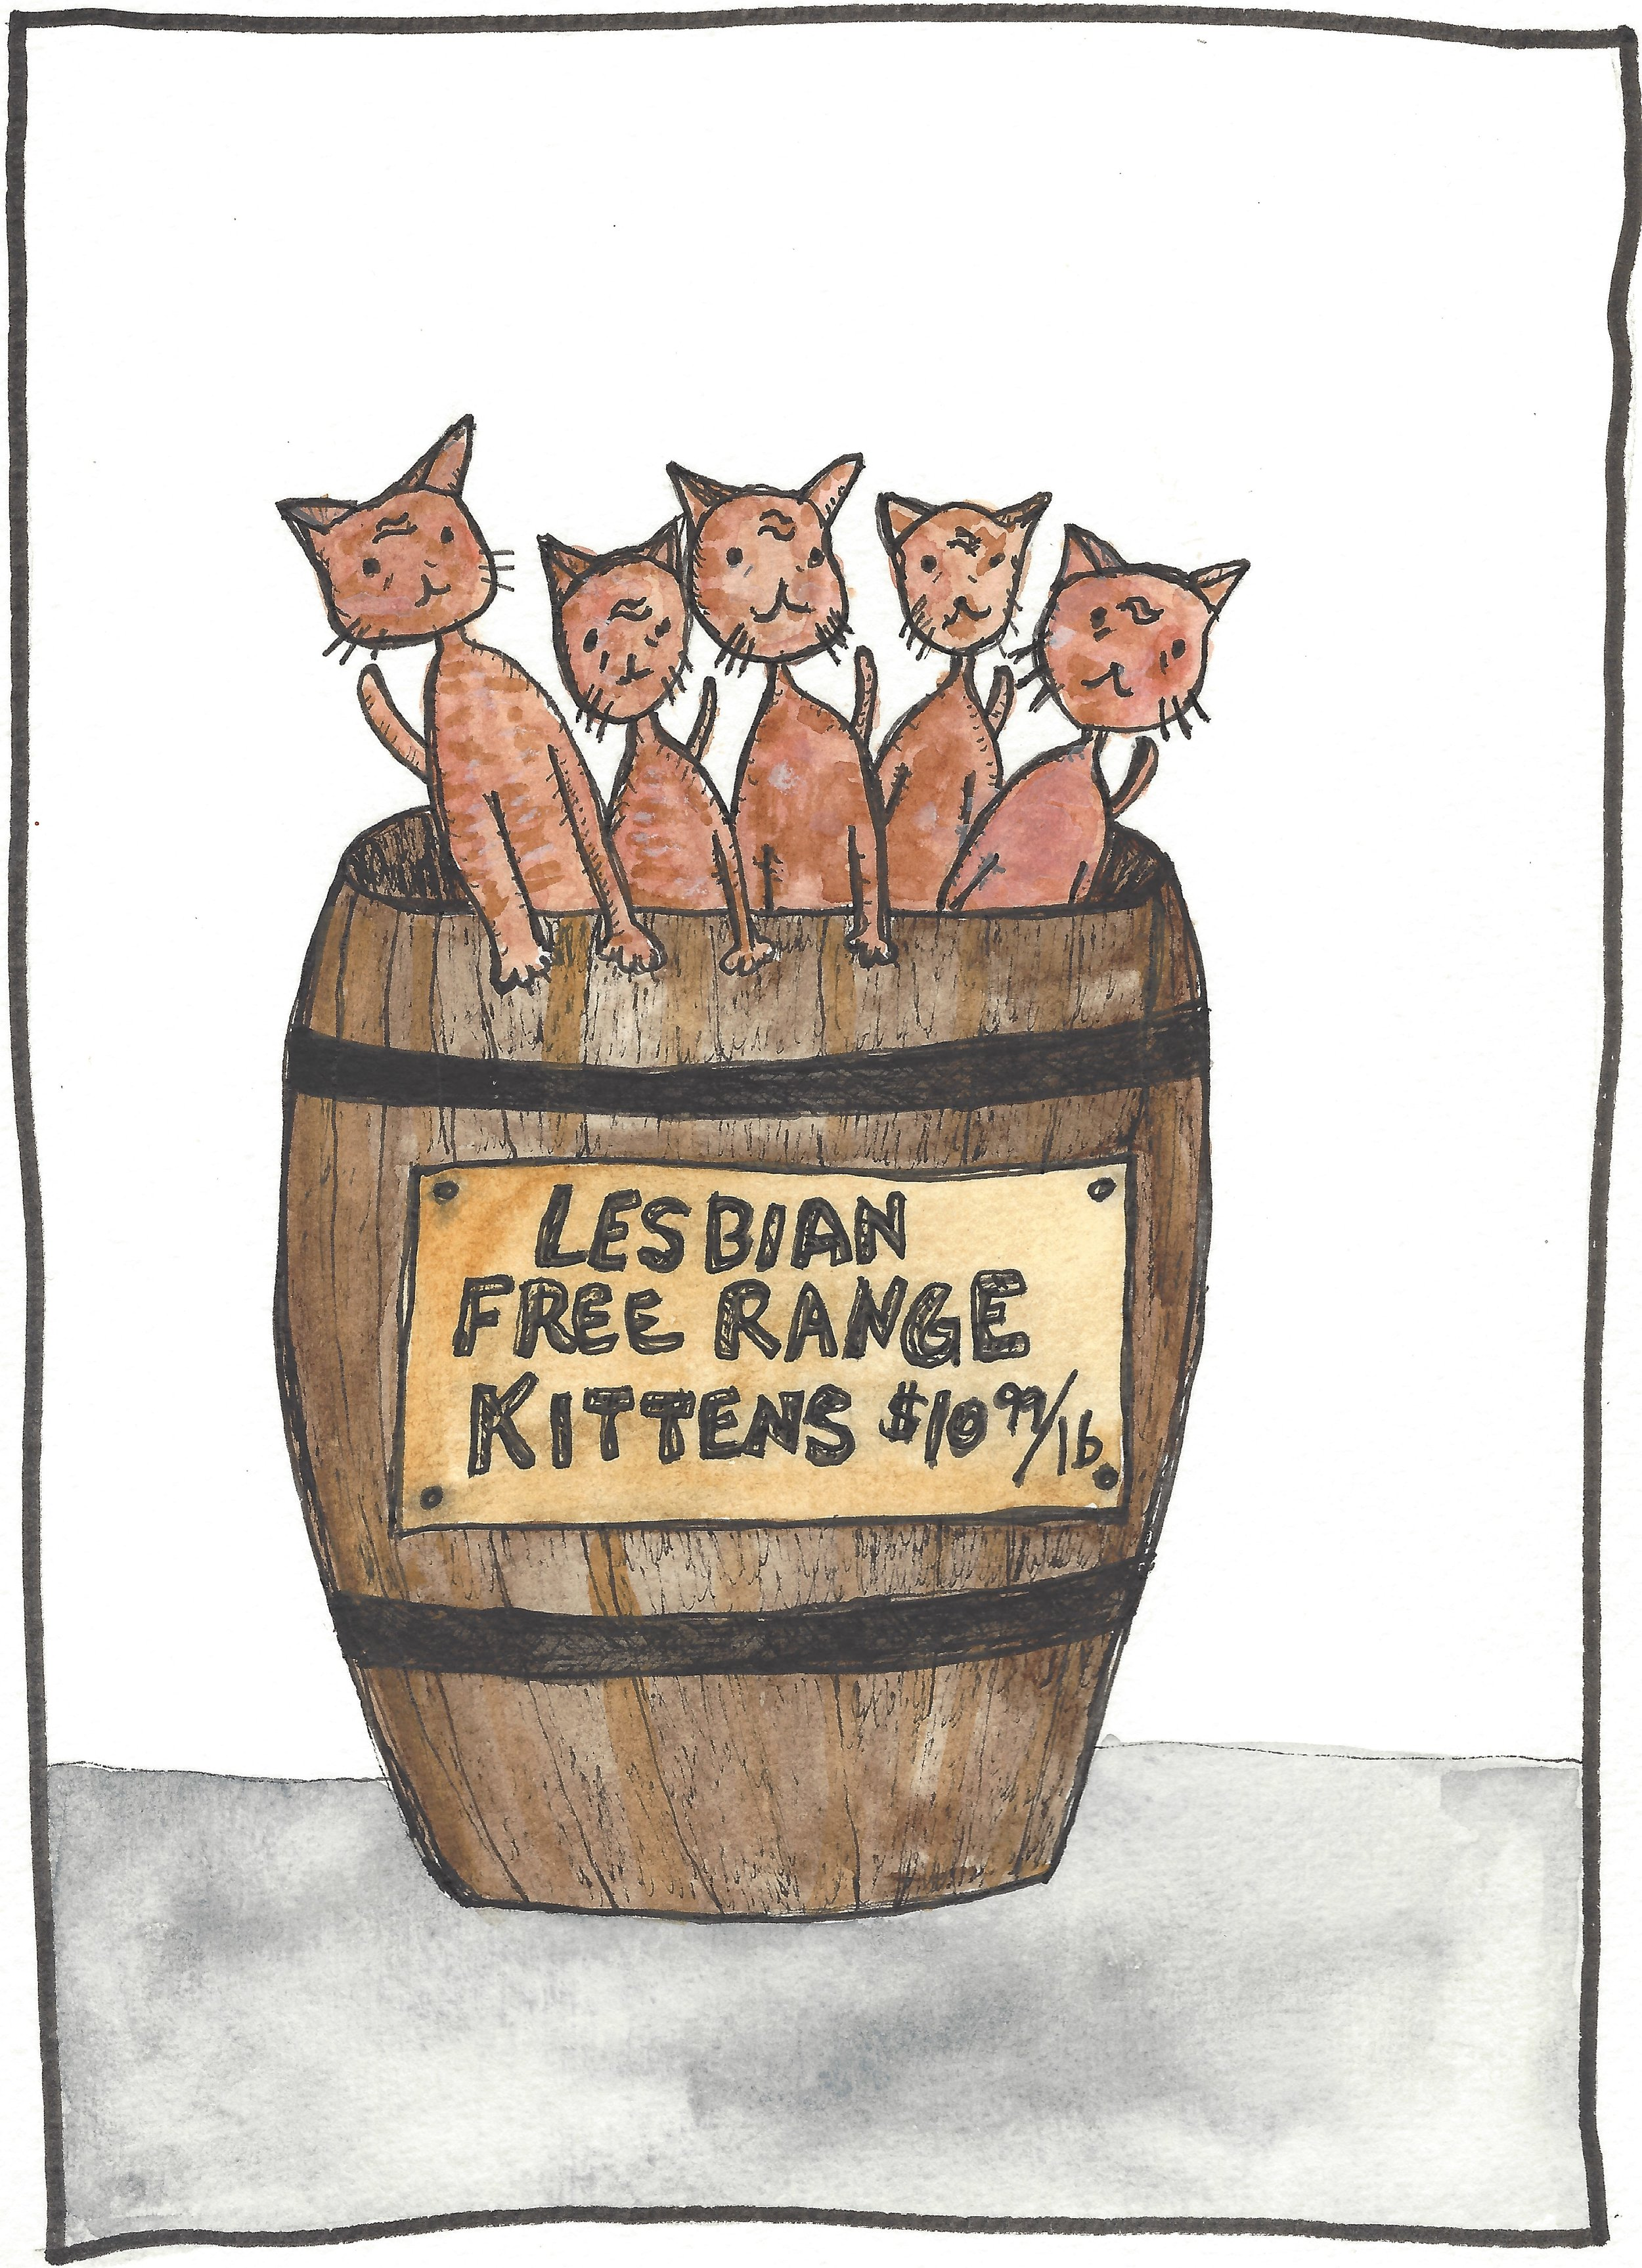 Lesbian Free Range Kittens